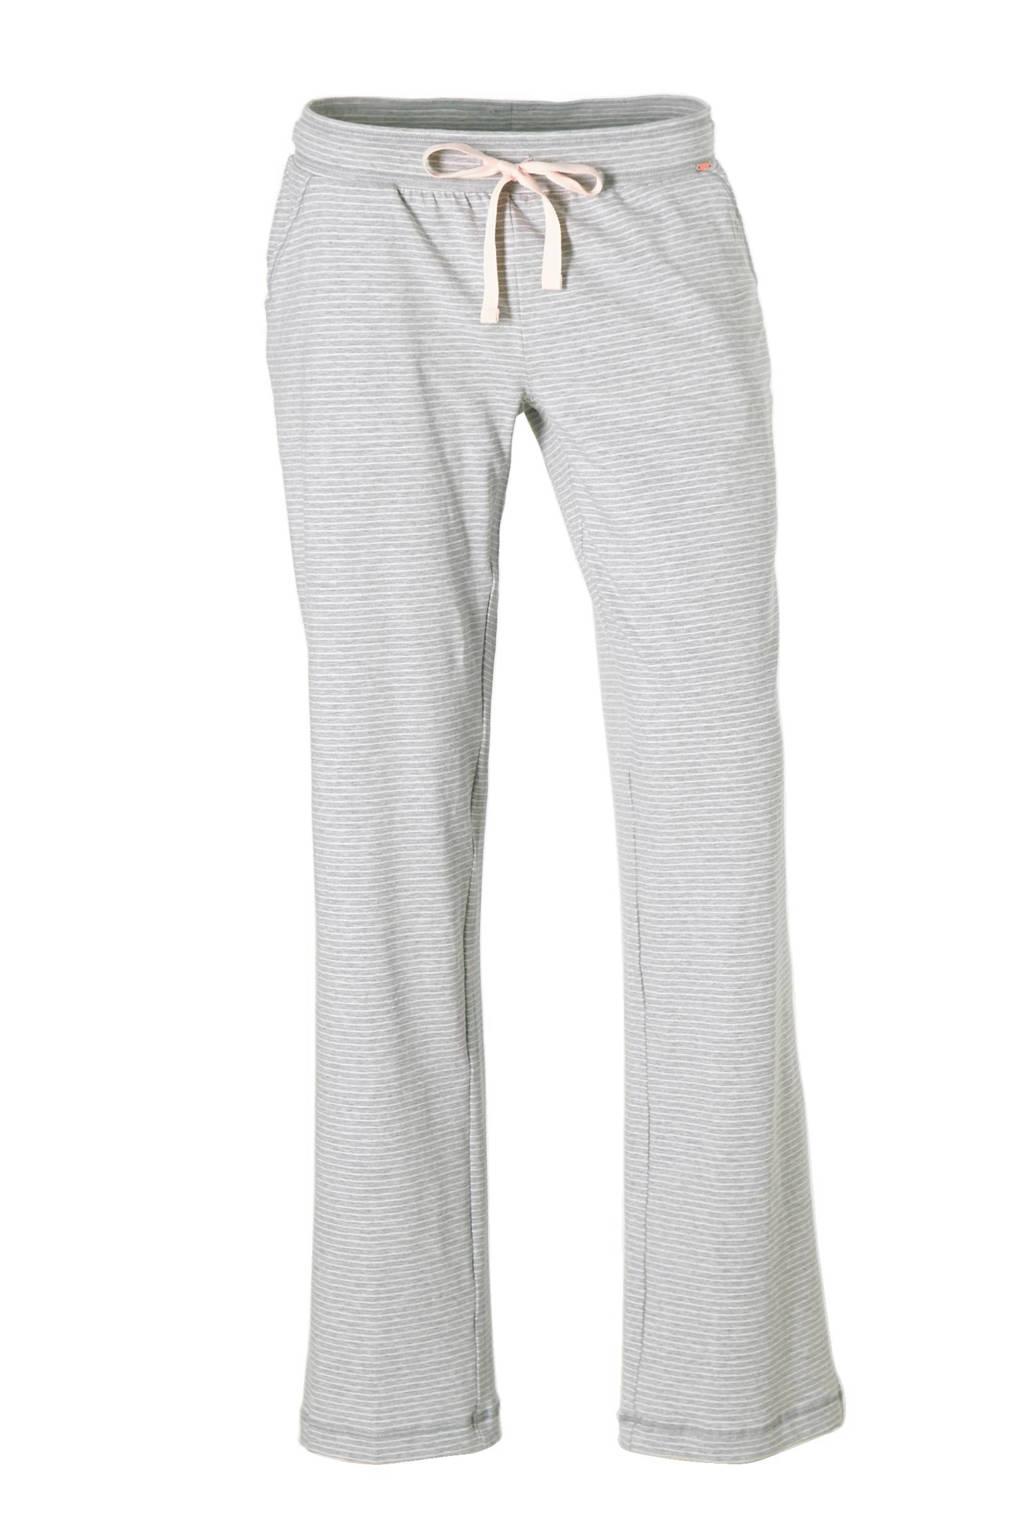 SKINY sleep & dream pyjamabroek, Grijs/wit